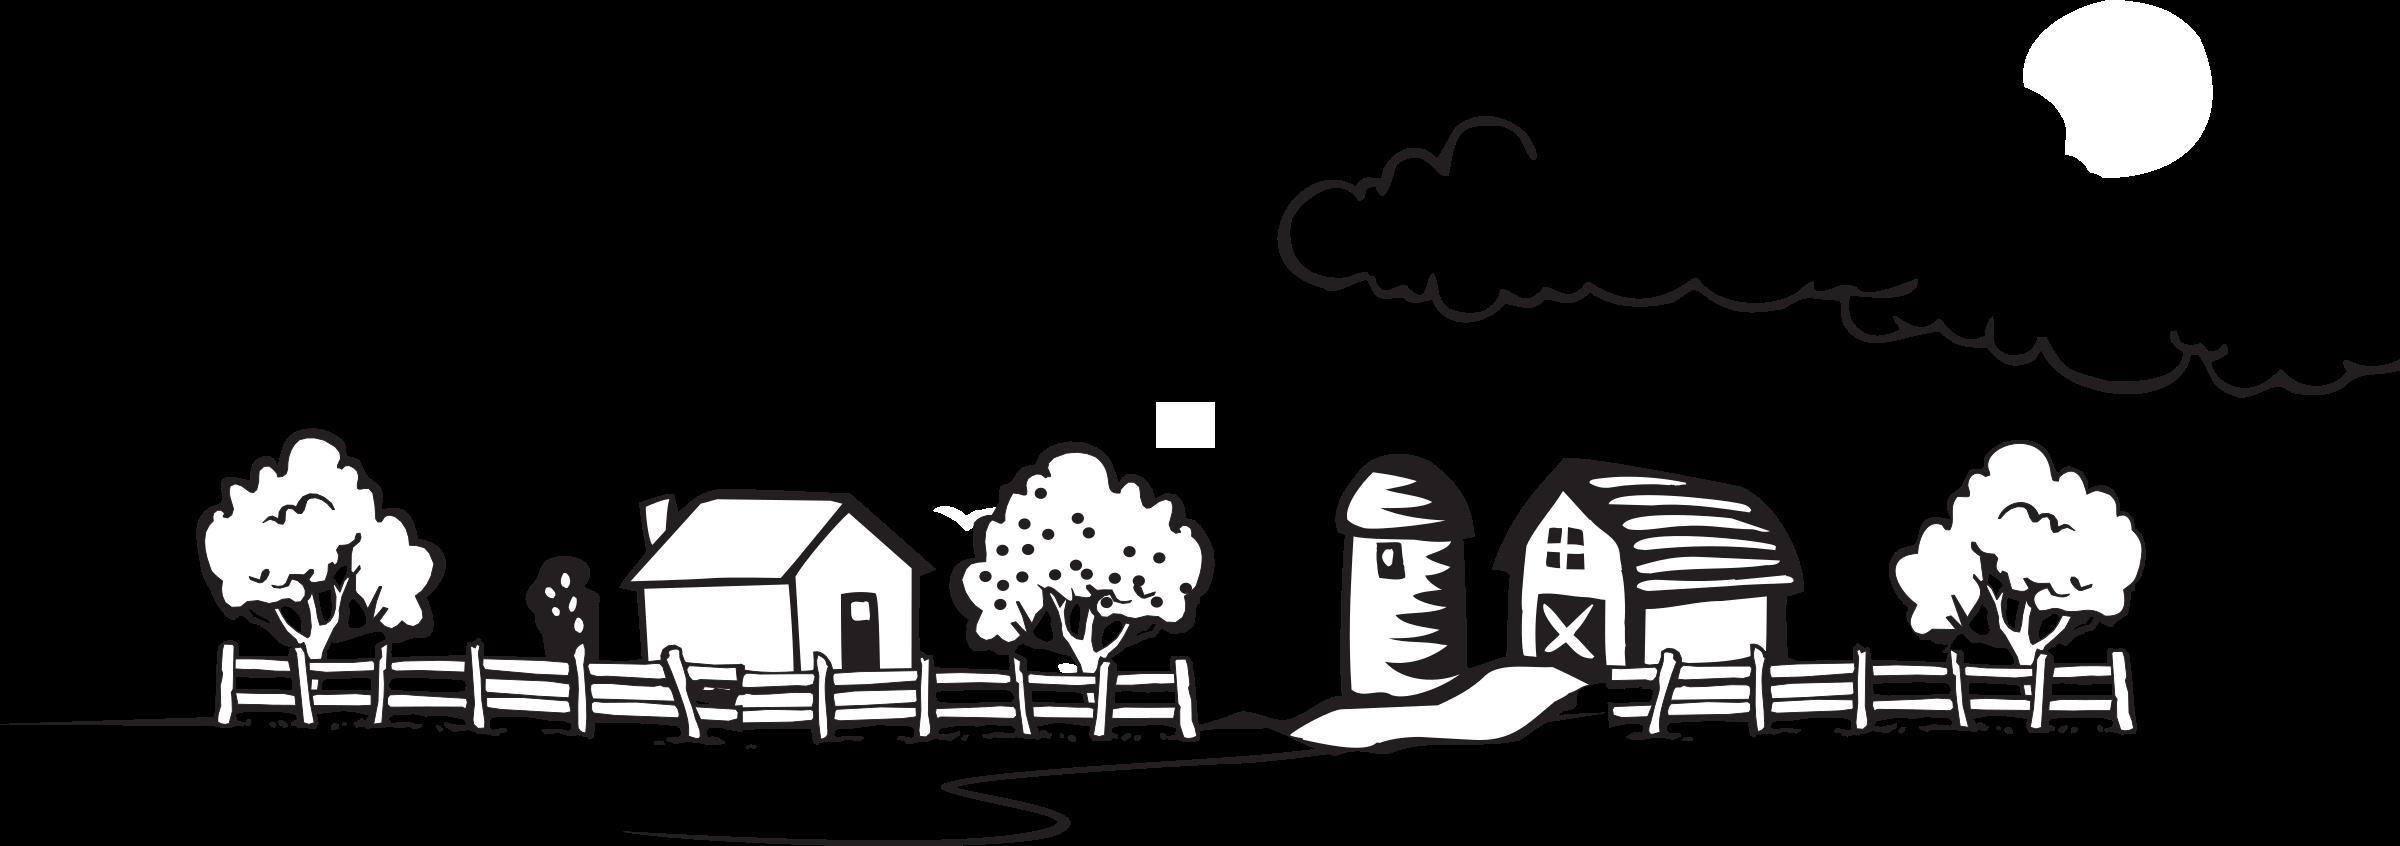 collection of coloring. Farmhouse clipart farm landscape